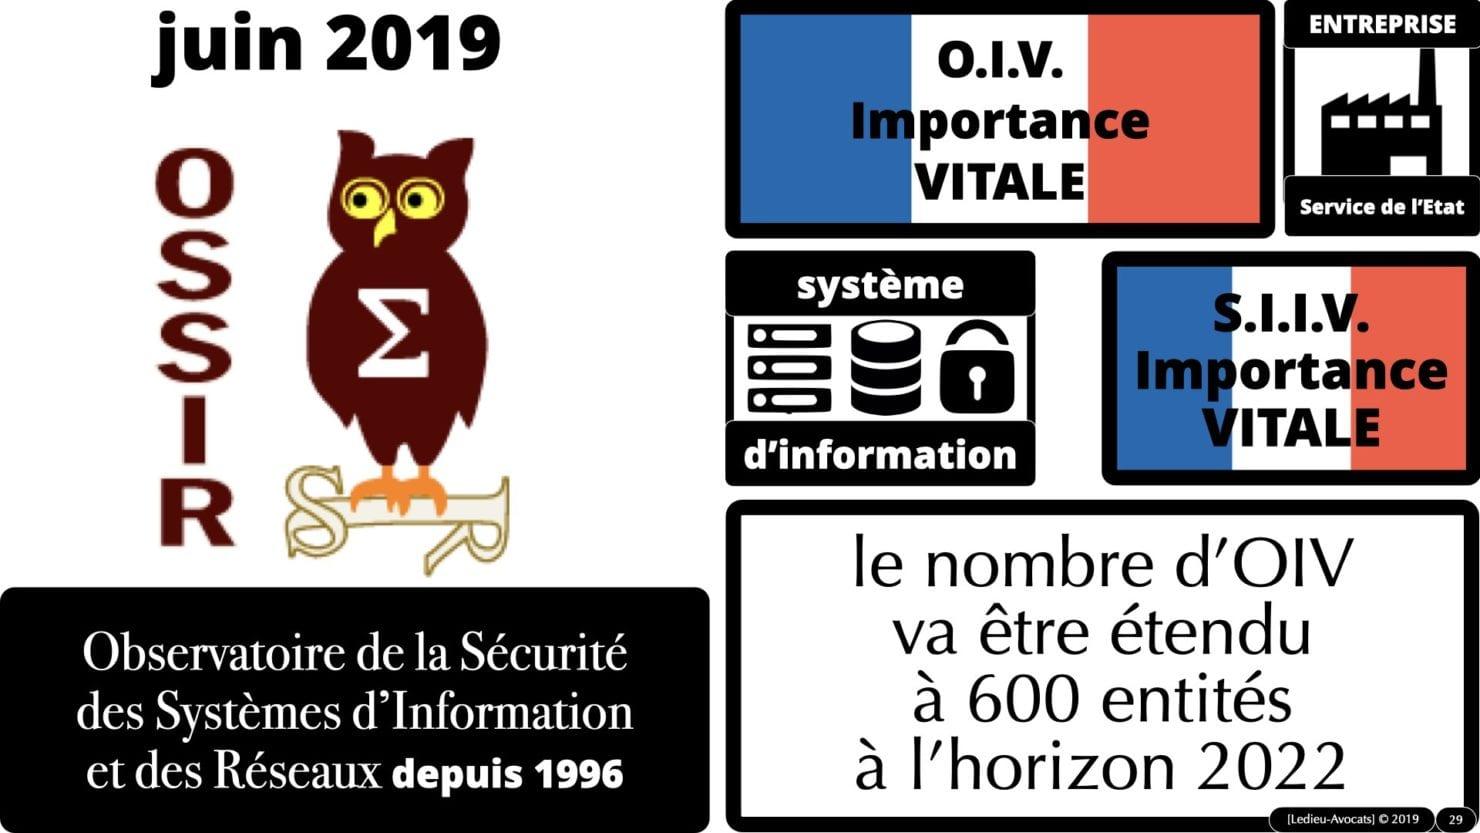 337 cyber sécurité #1 OIV OSE Critical Entities © Ledieu-avocat 15-06-2021.029